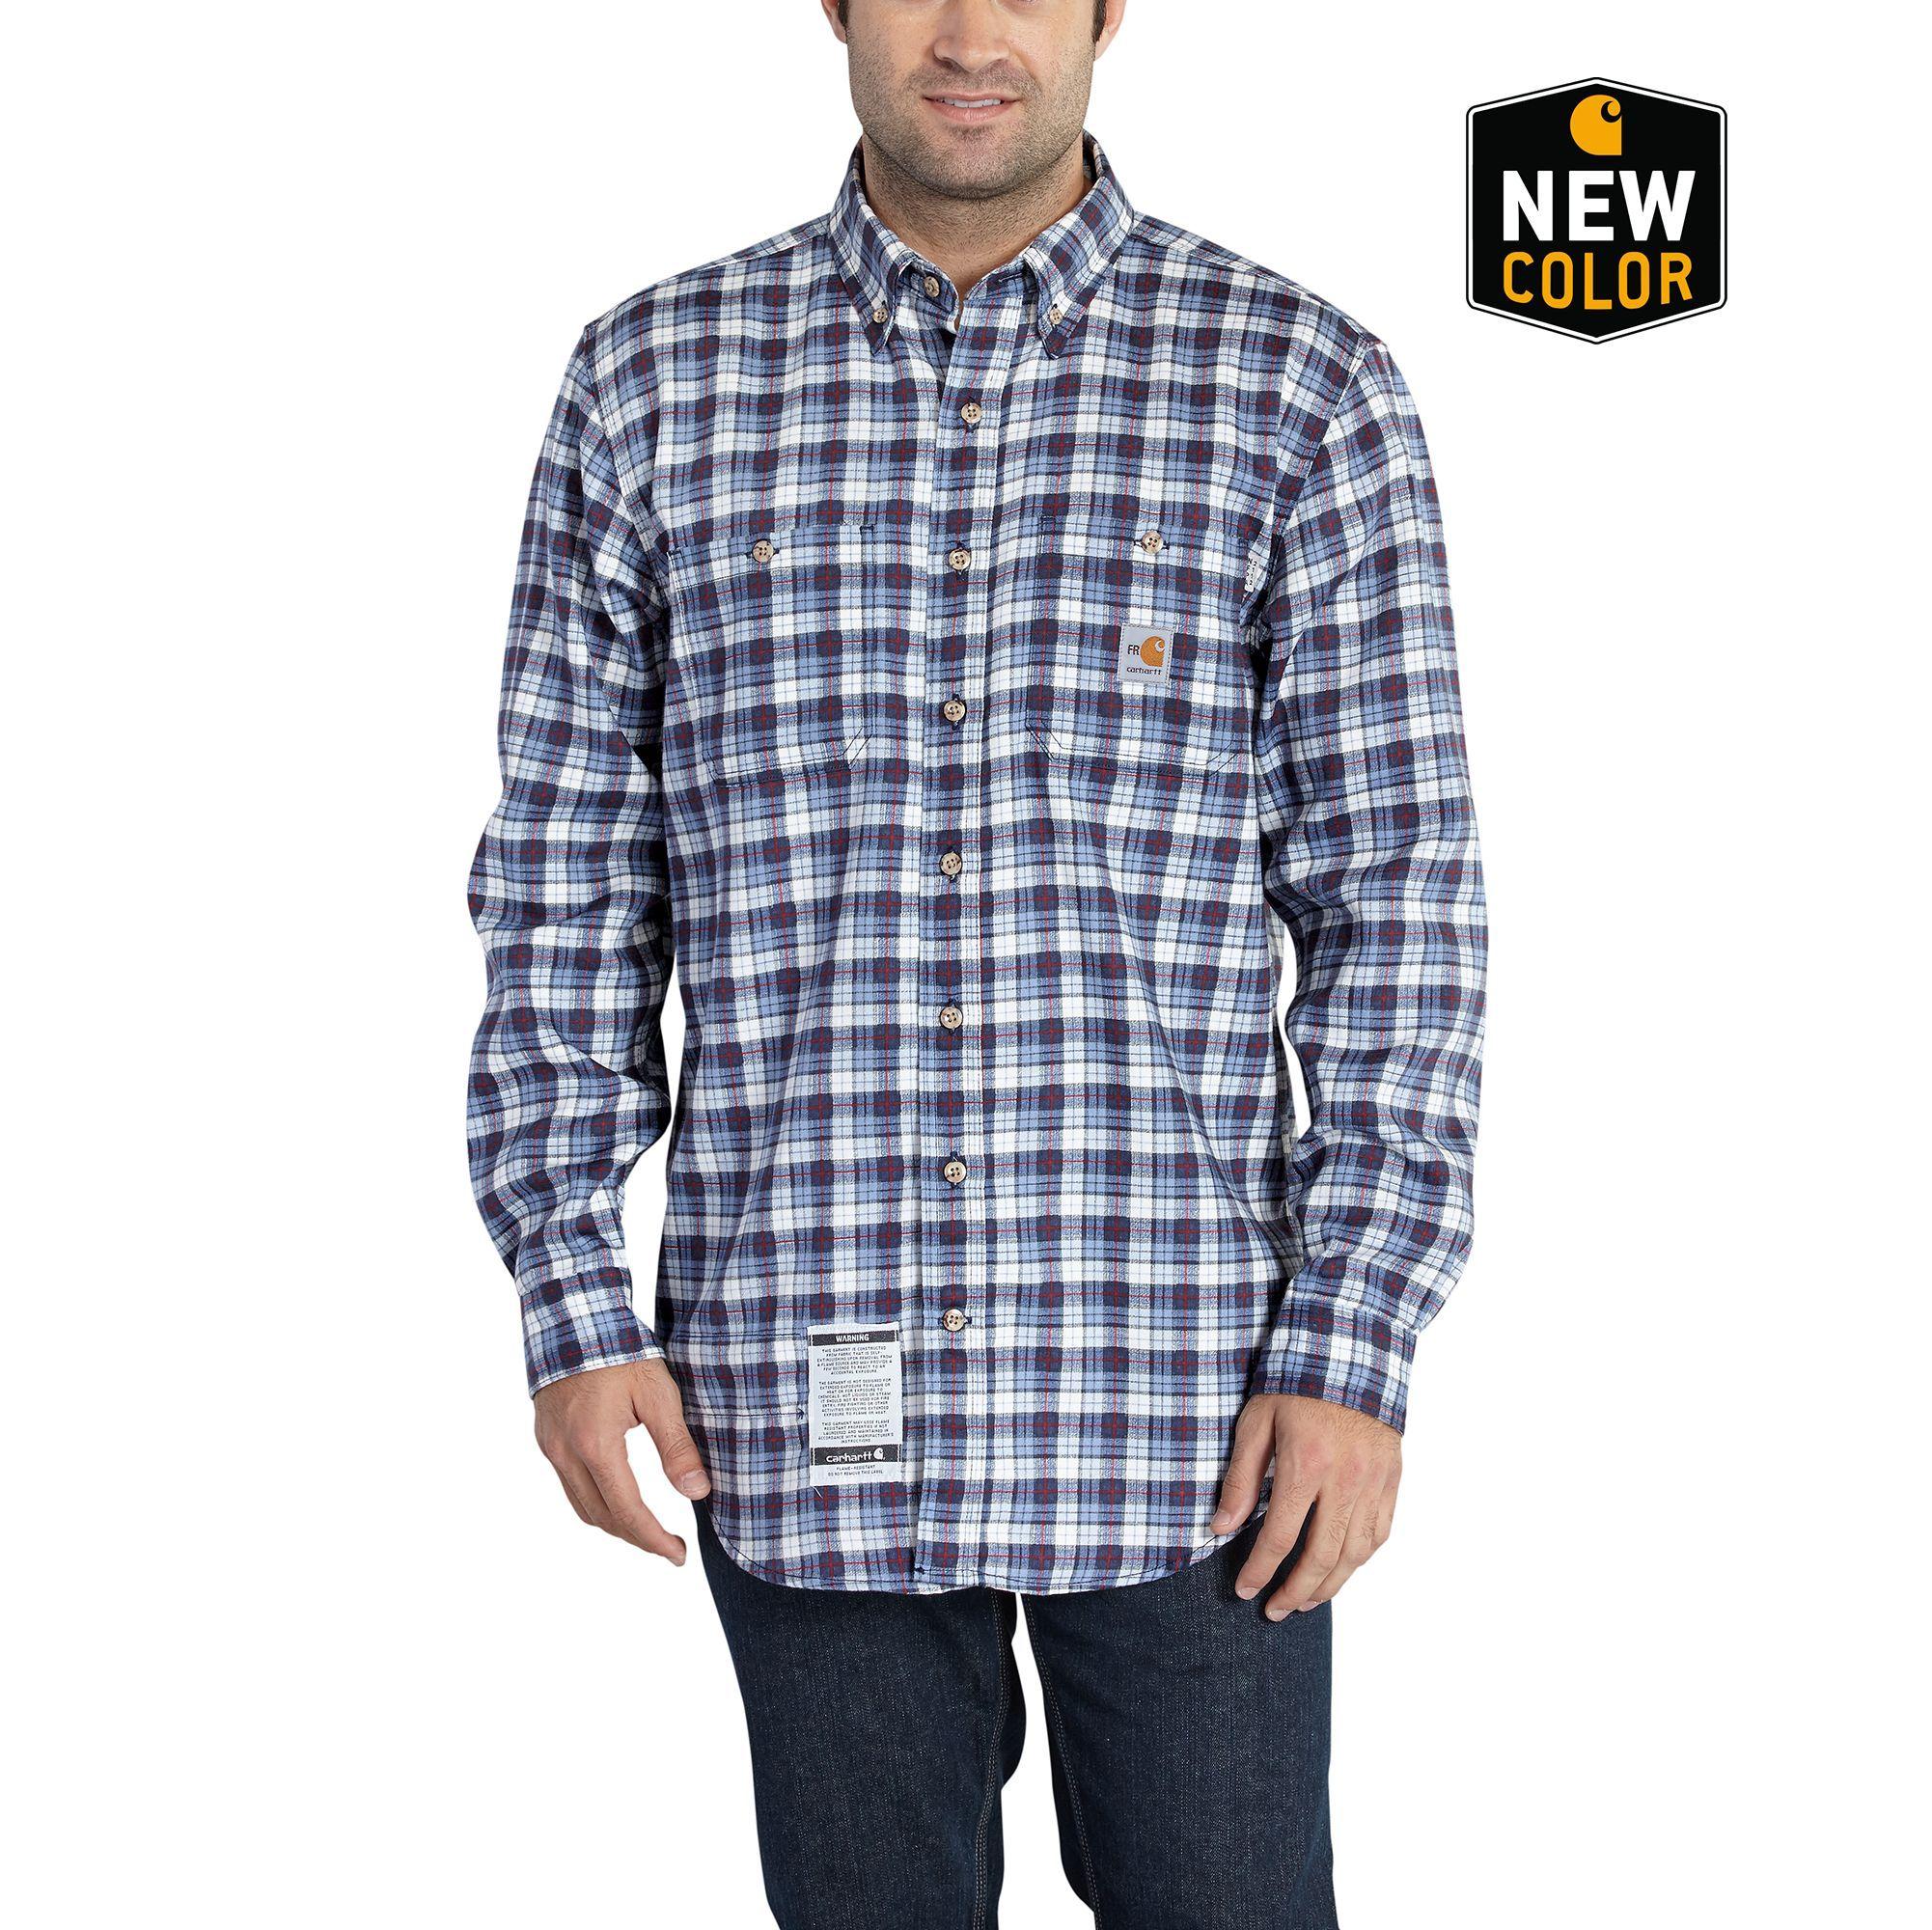 Carhartt - Mens Flame-Resistant Classic Plaid Shirt-Carhartt